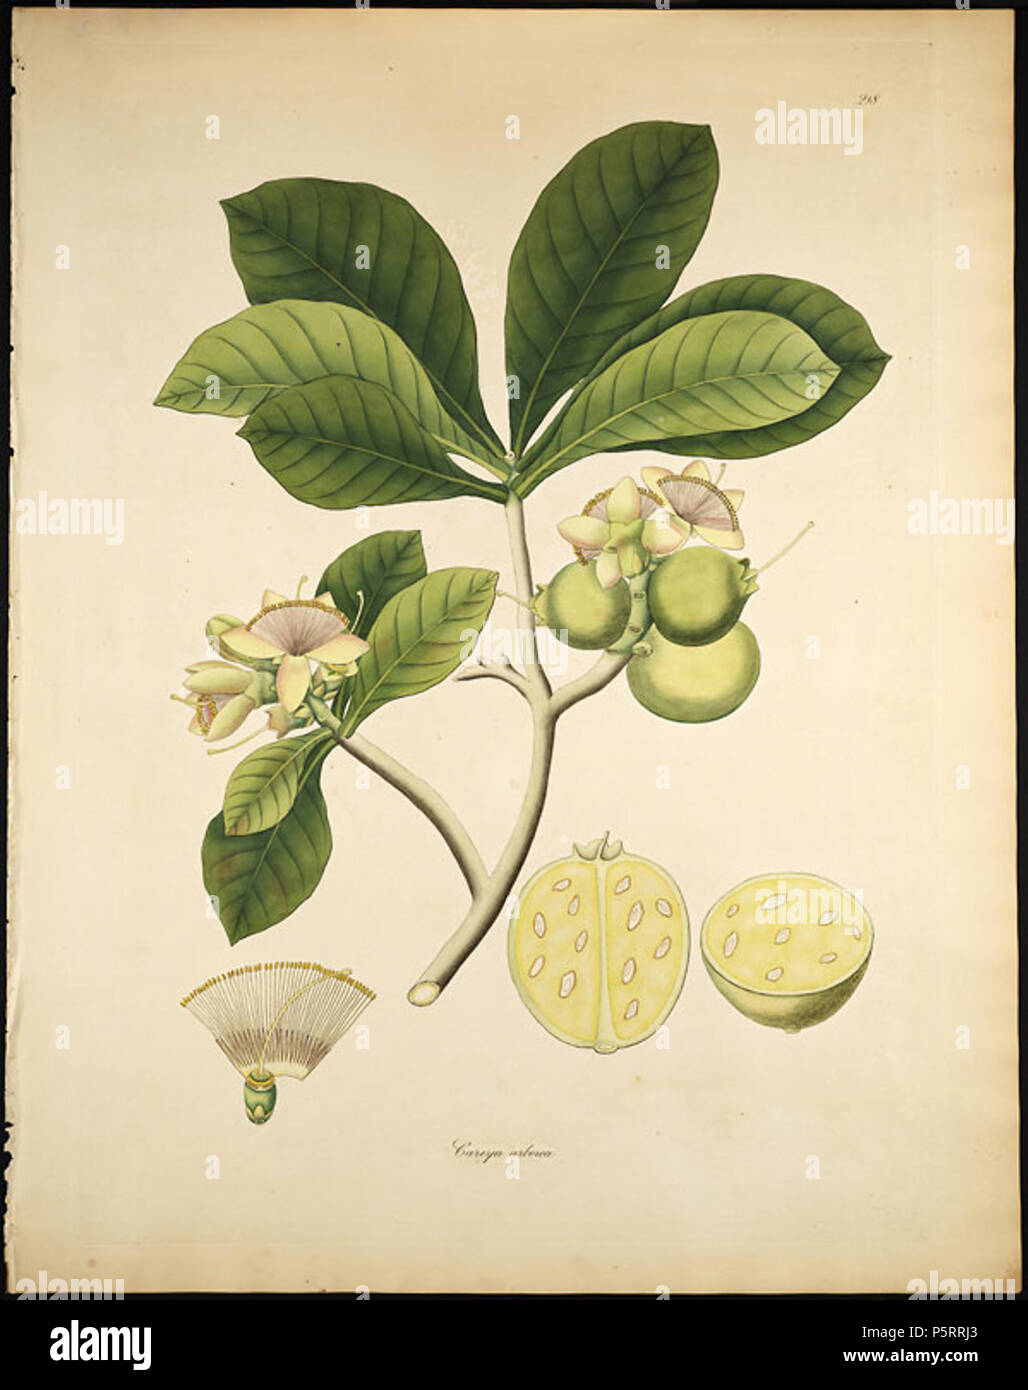 N/A  Careya arborea, the 'Slow Match Tree '   between 1795